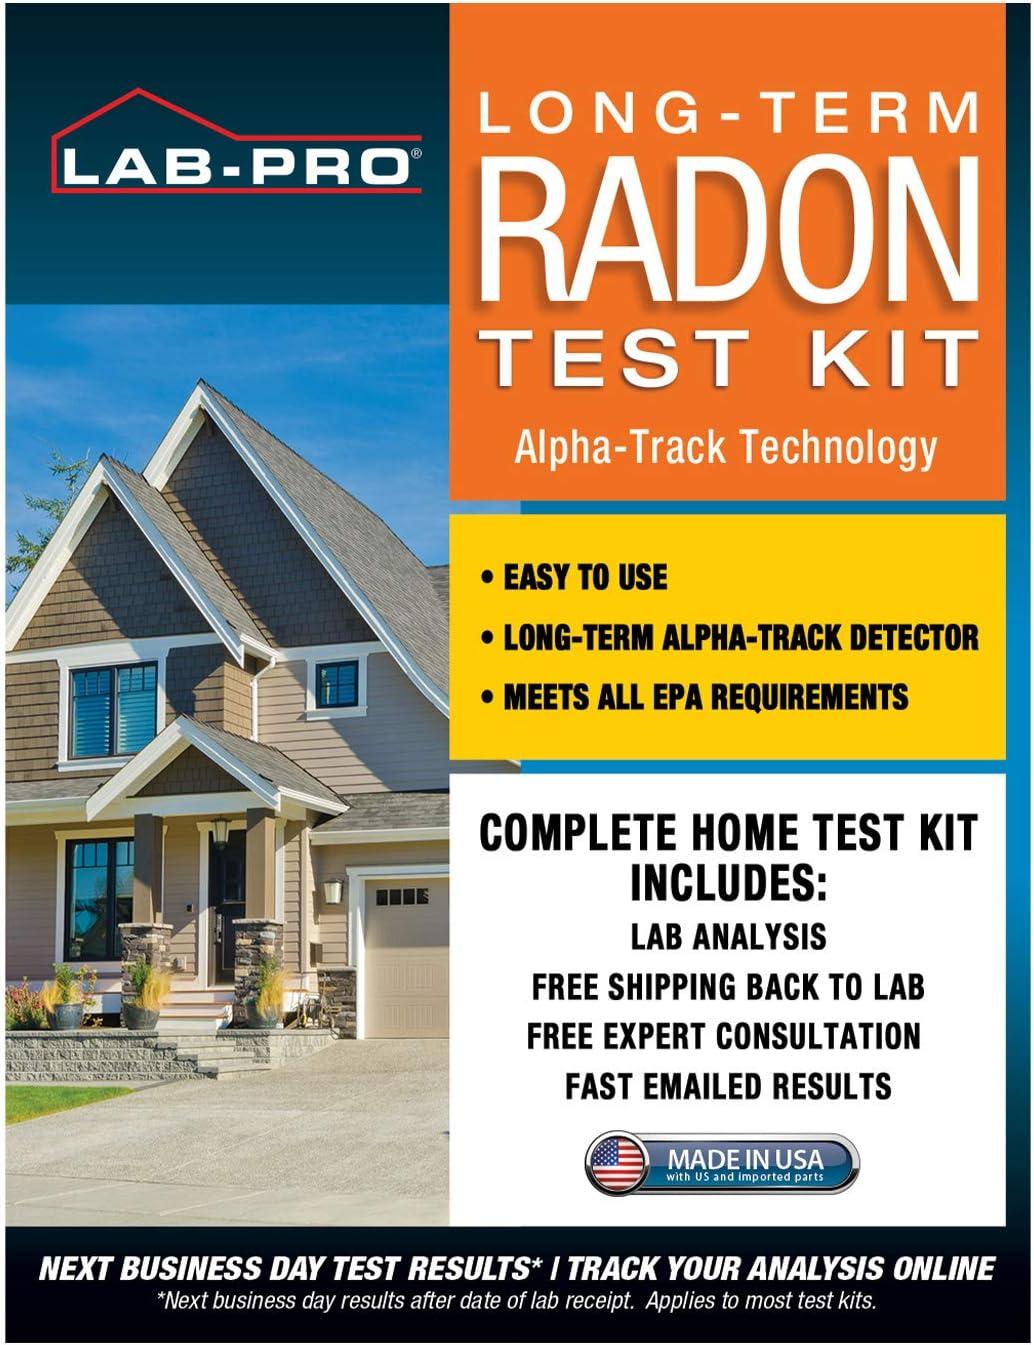 LABPRO Long Tern Radon Gas Test Kit - Includes 1 EPA Approved Radon Gas Detector for Radon Testing, Pre-Paid Return Mailer - Radon Lab Analysis - Emailed Radon Report and Expert Consultation